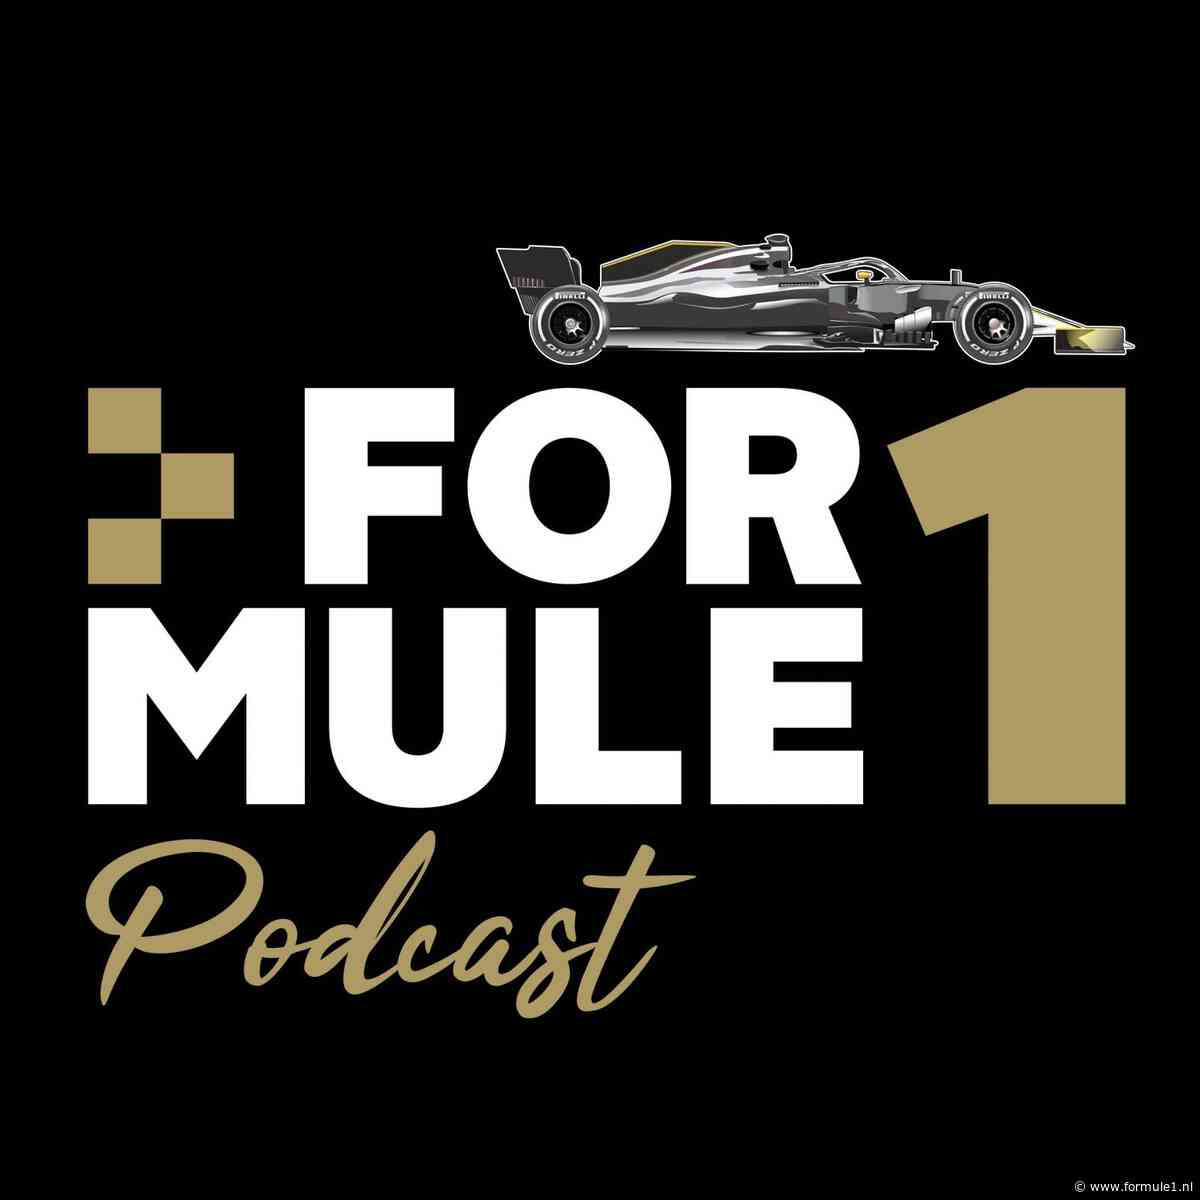 Paddockpraat Podcast: 'Schoolreis' in Abu Dhabi, afscheid Kubica en Hulk en update Zandvoort